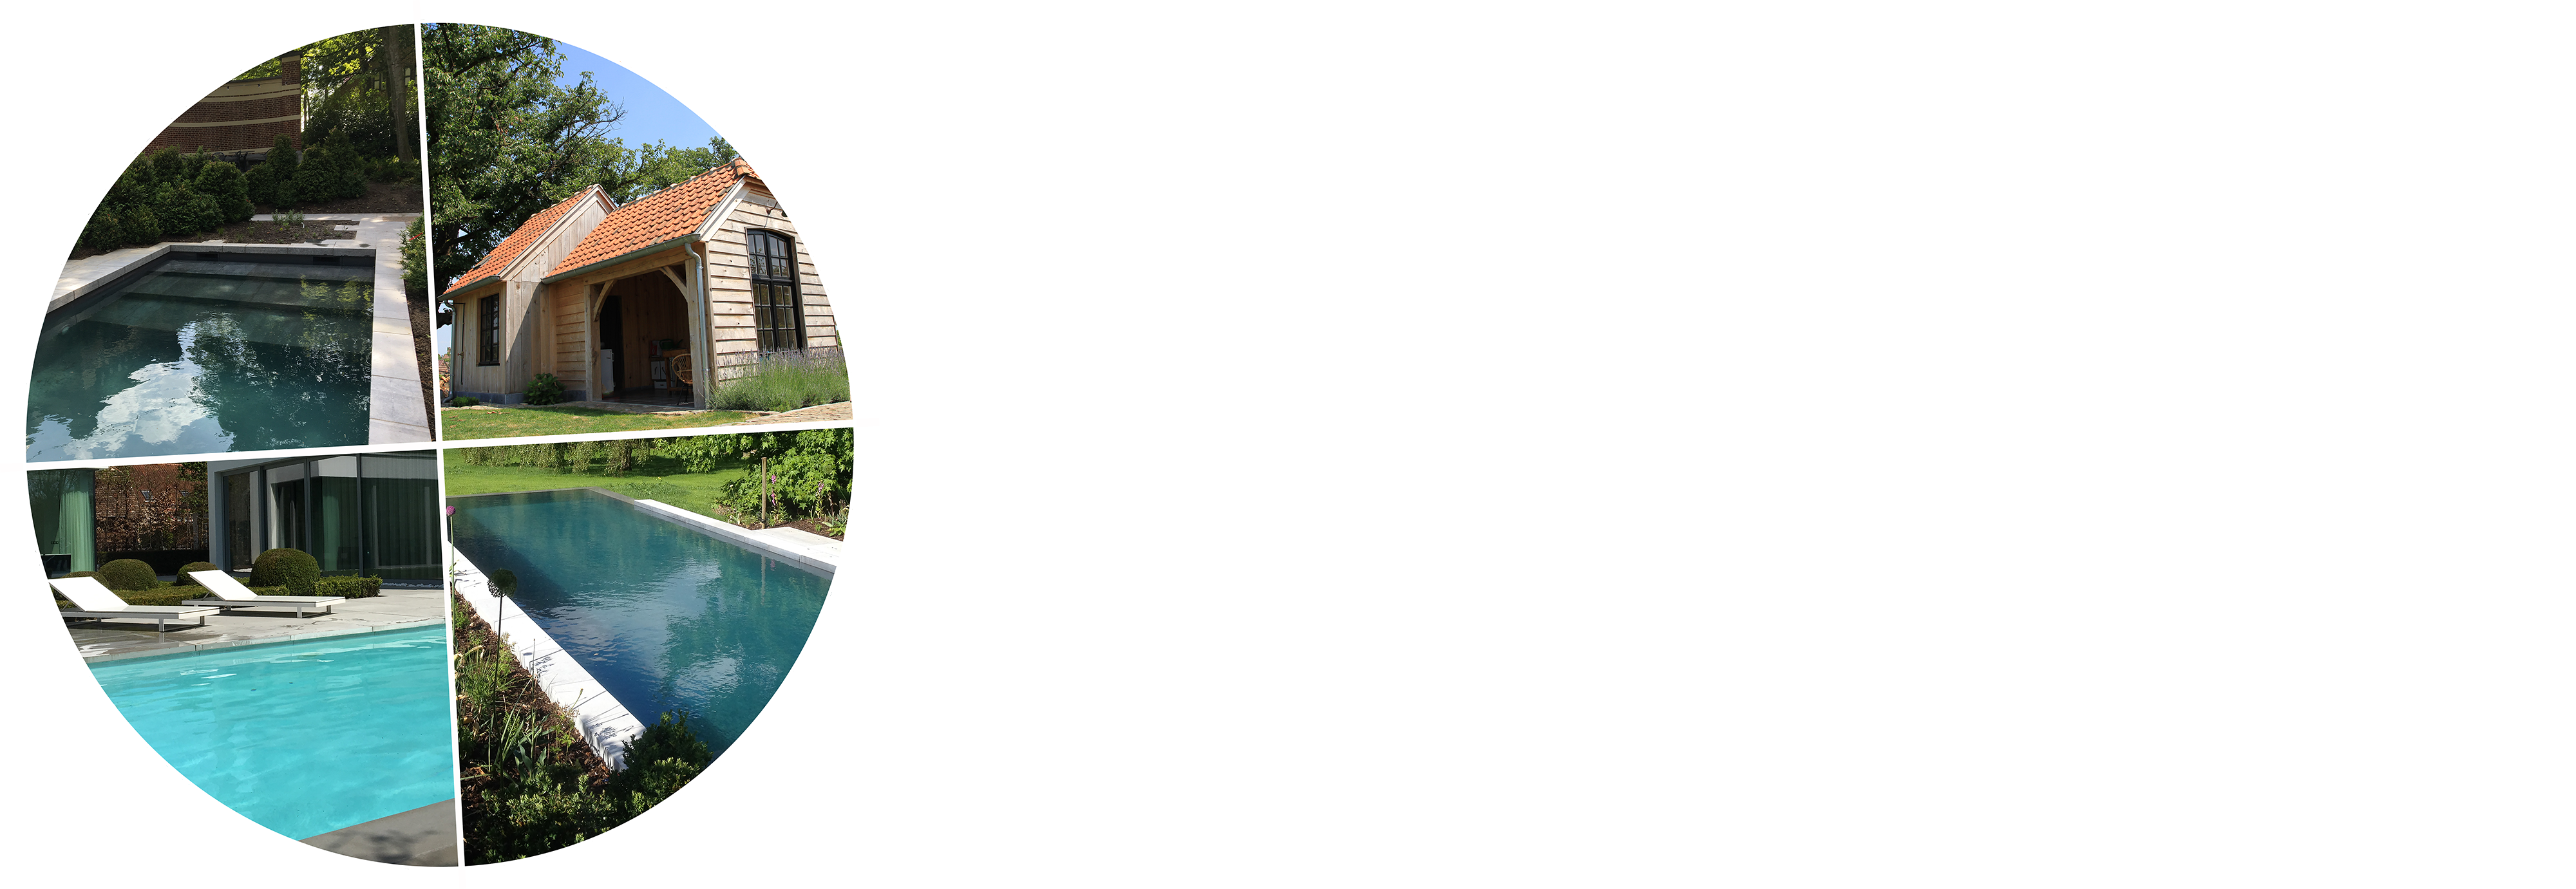 Aquaservice Willems